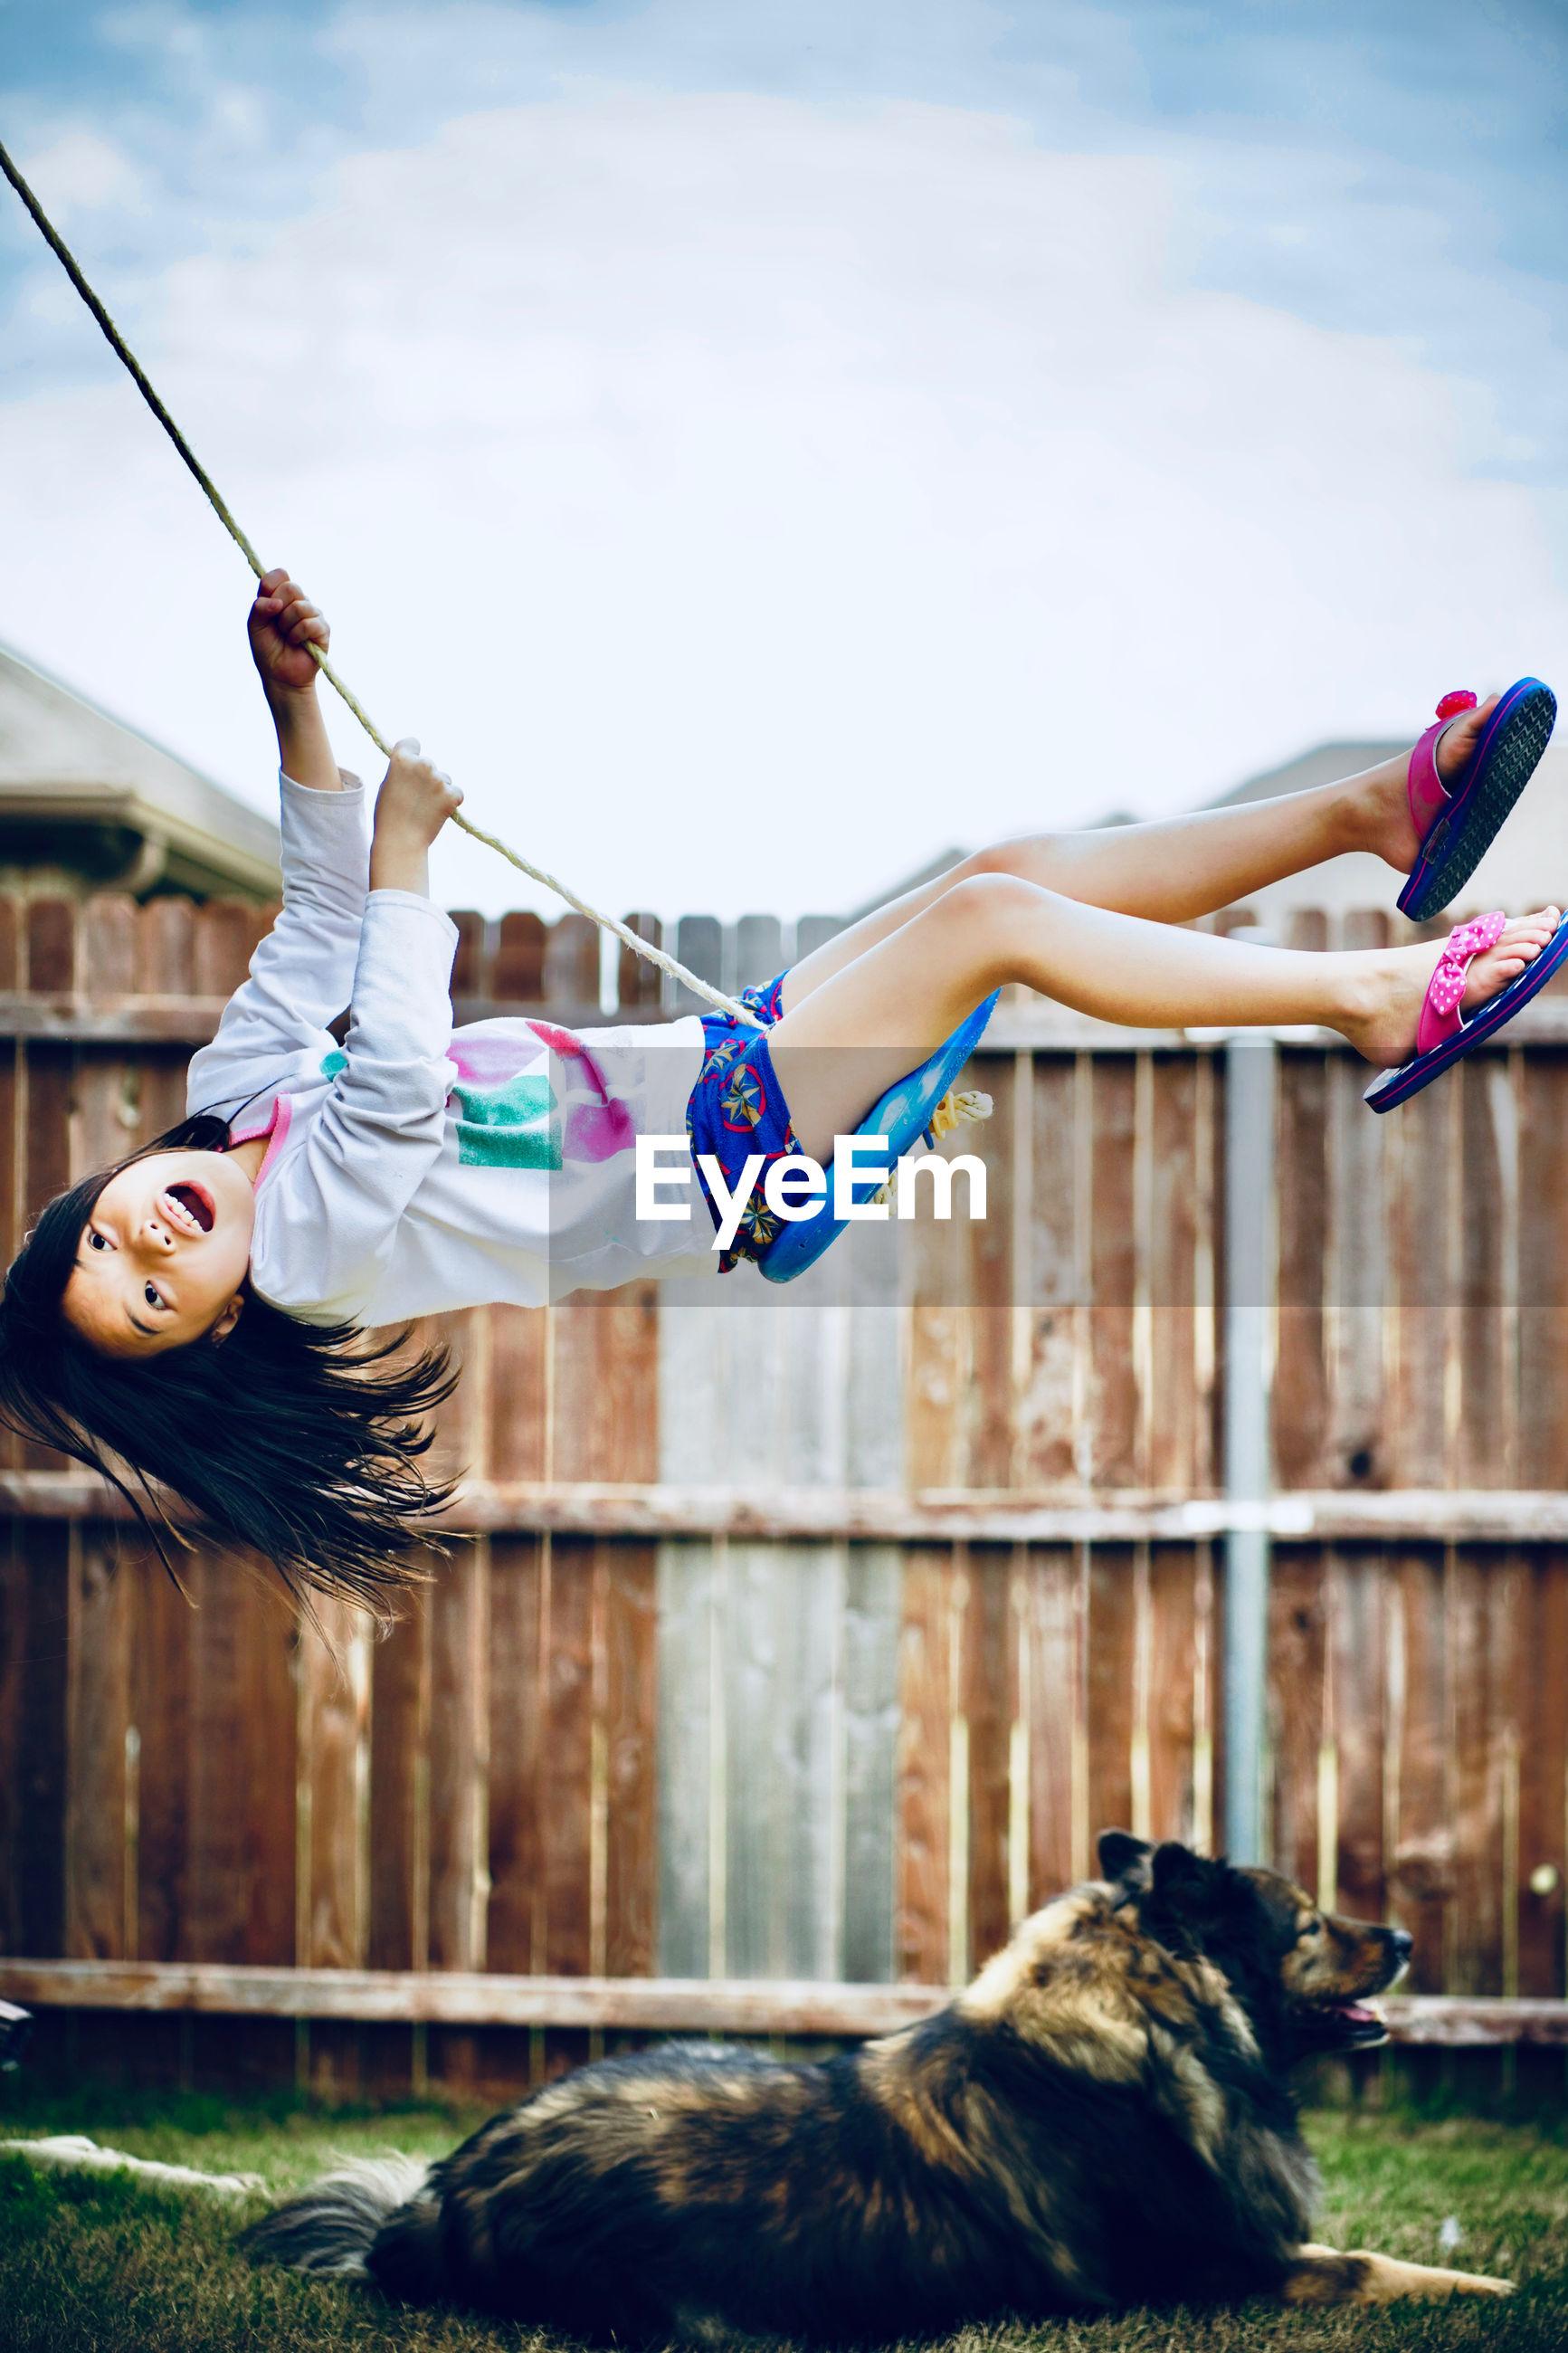 Side view of girl swinging over dog against sky